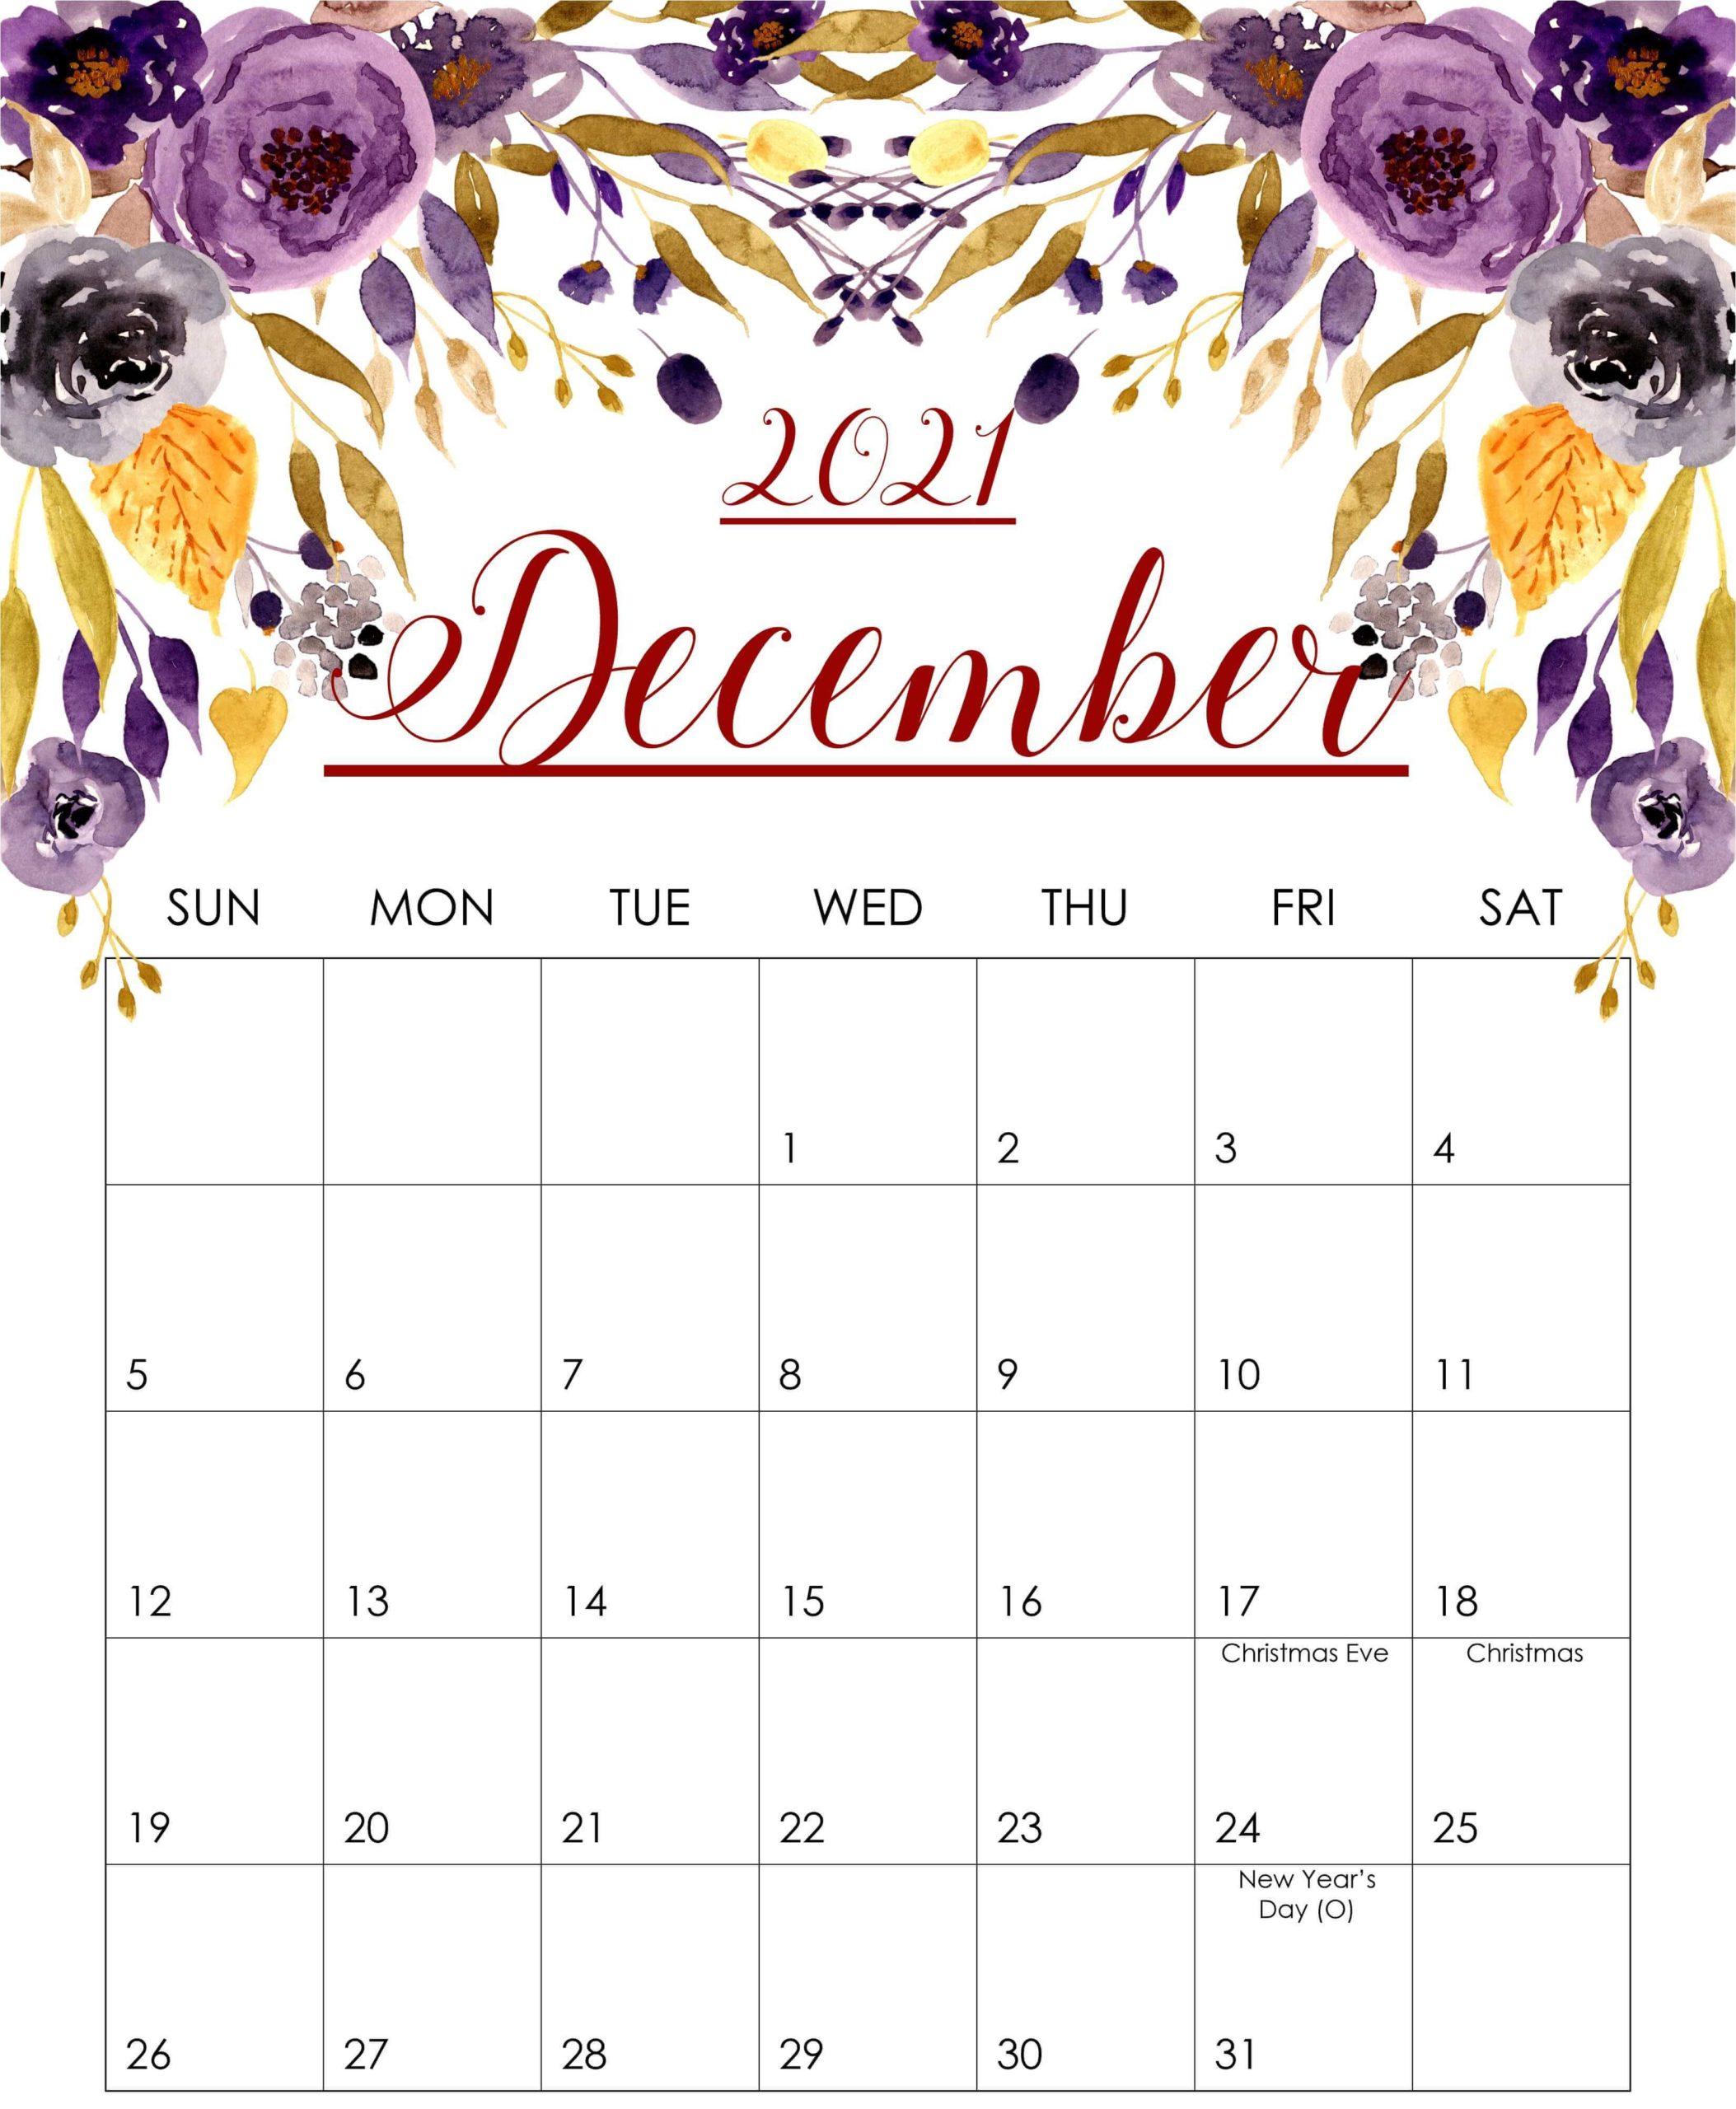 December Floral Calendar 2021